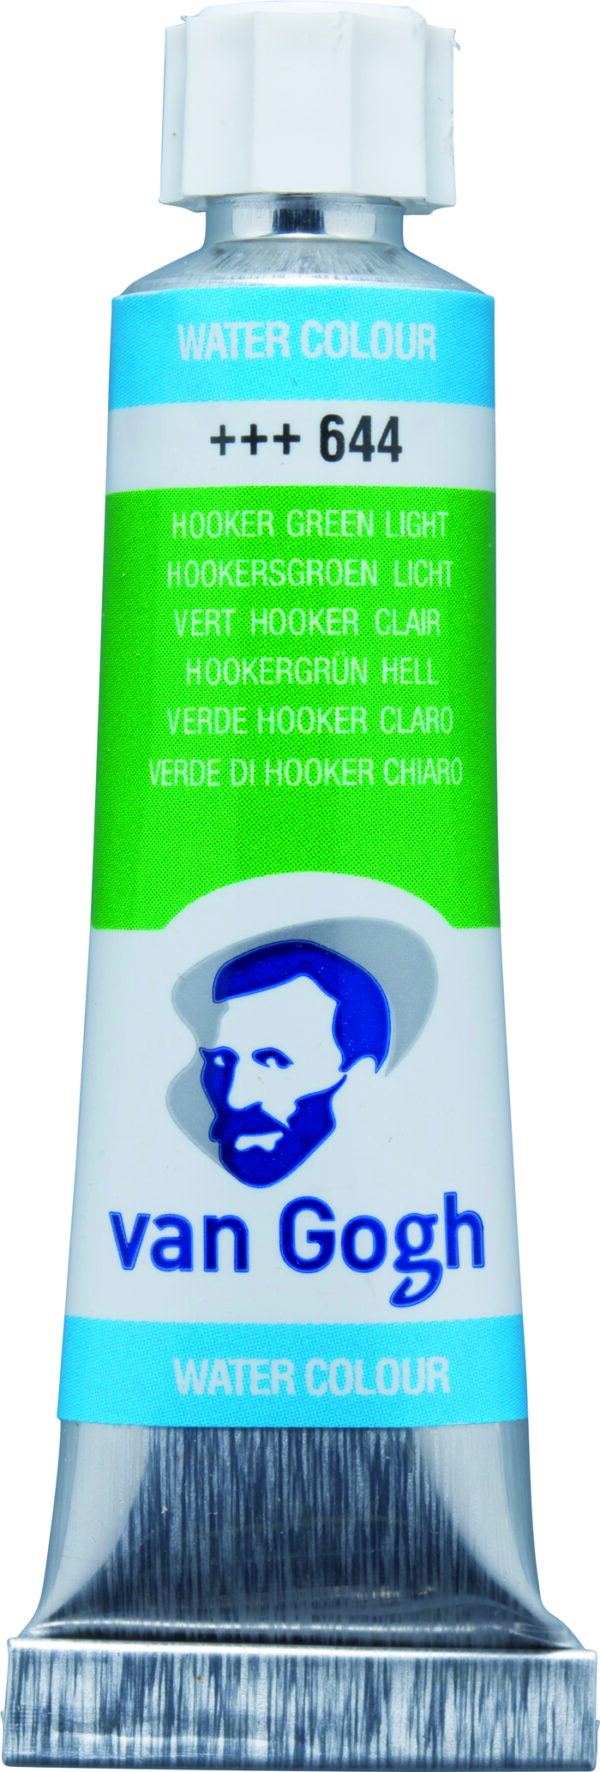 Van Gogh 644 Hooker green Light - 10 ml